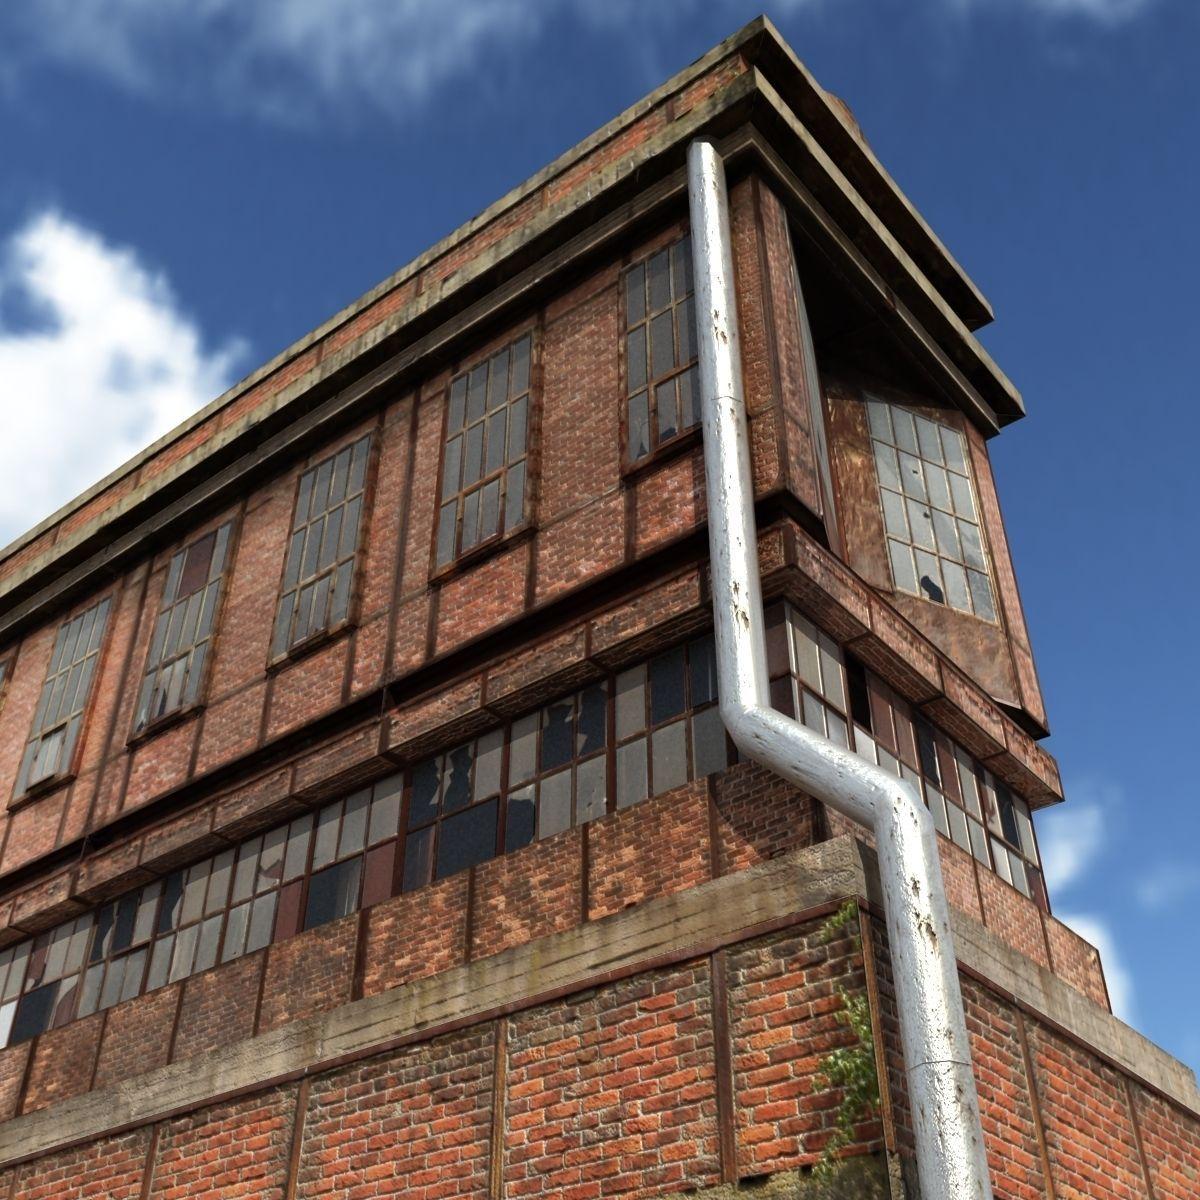 Factory low poly building 3d model 3d model max obj for 3d max building